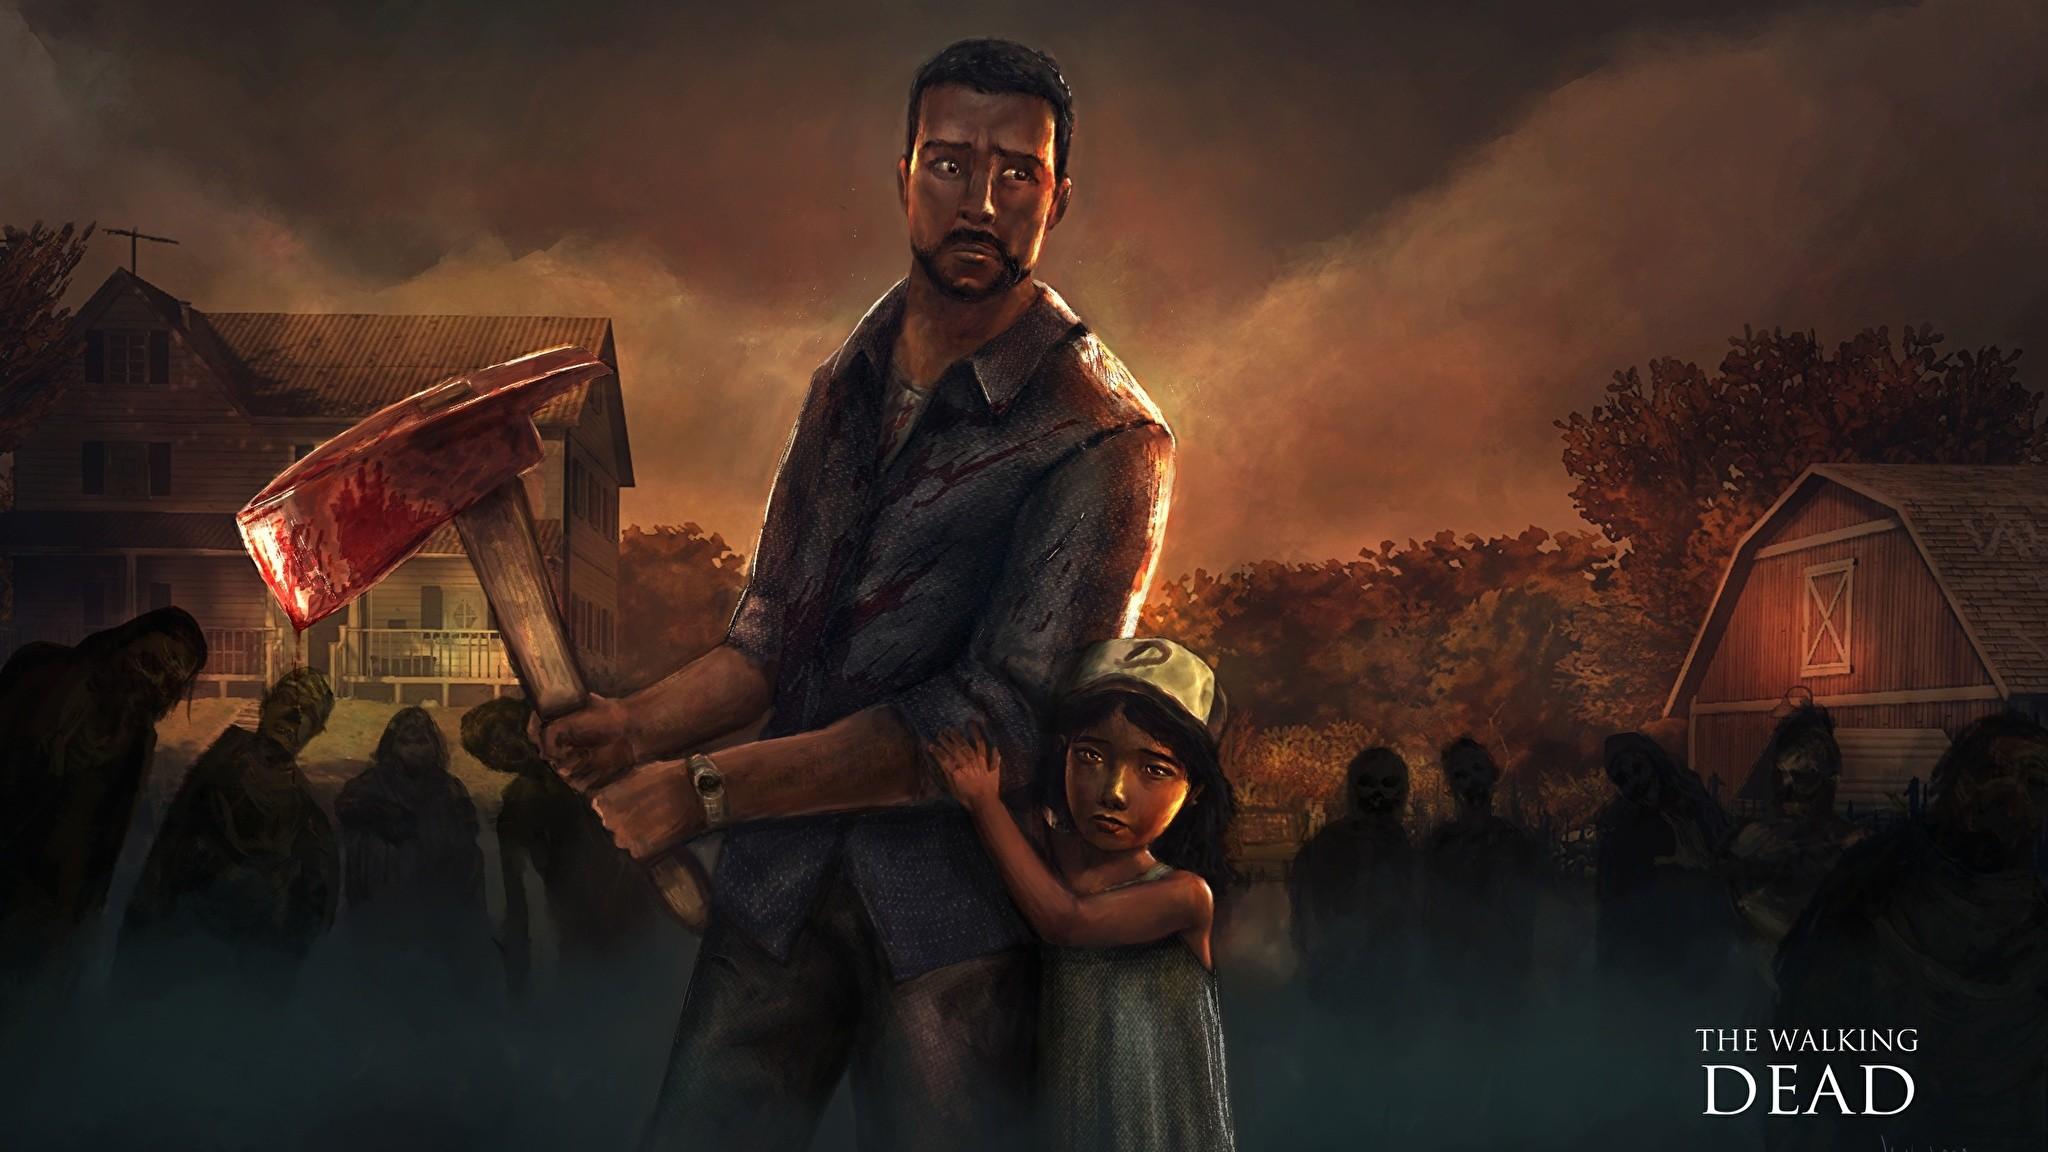 Images Little girls Battle axes Man The Walking Dead Games Men